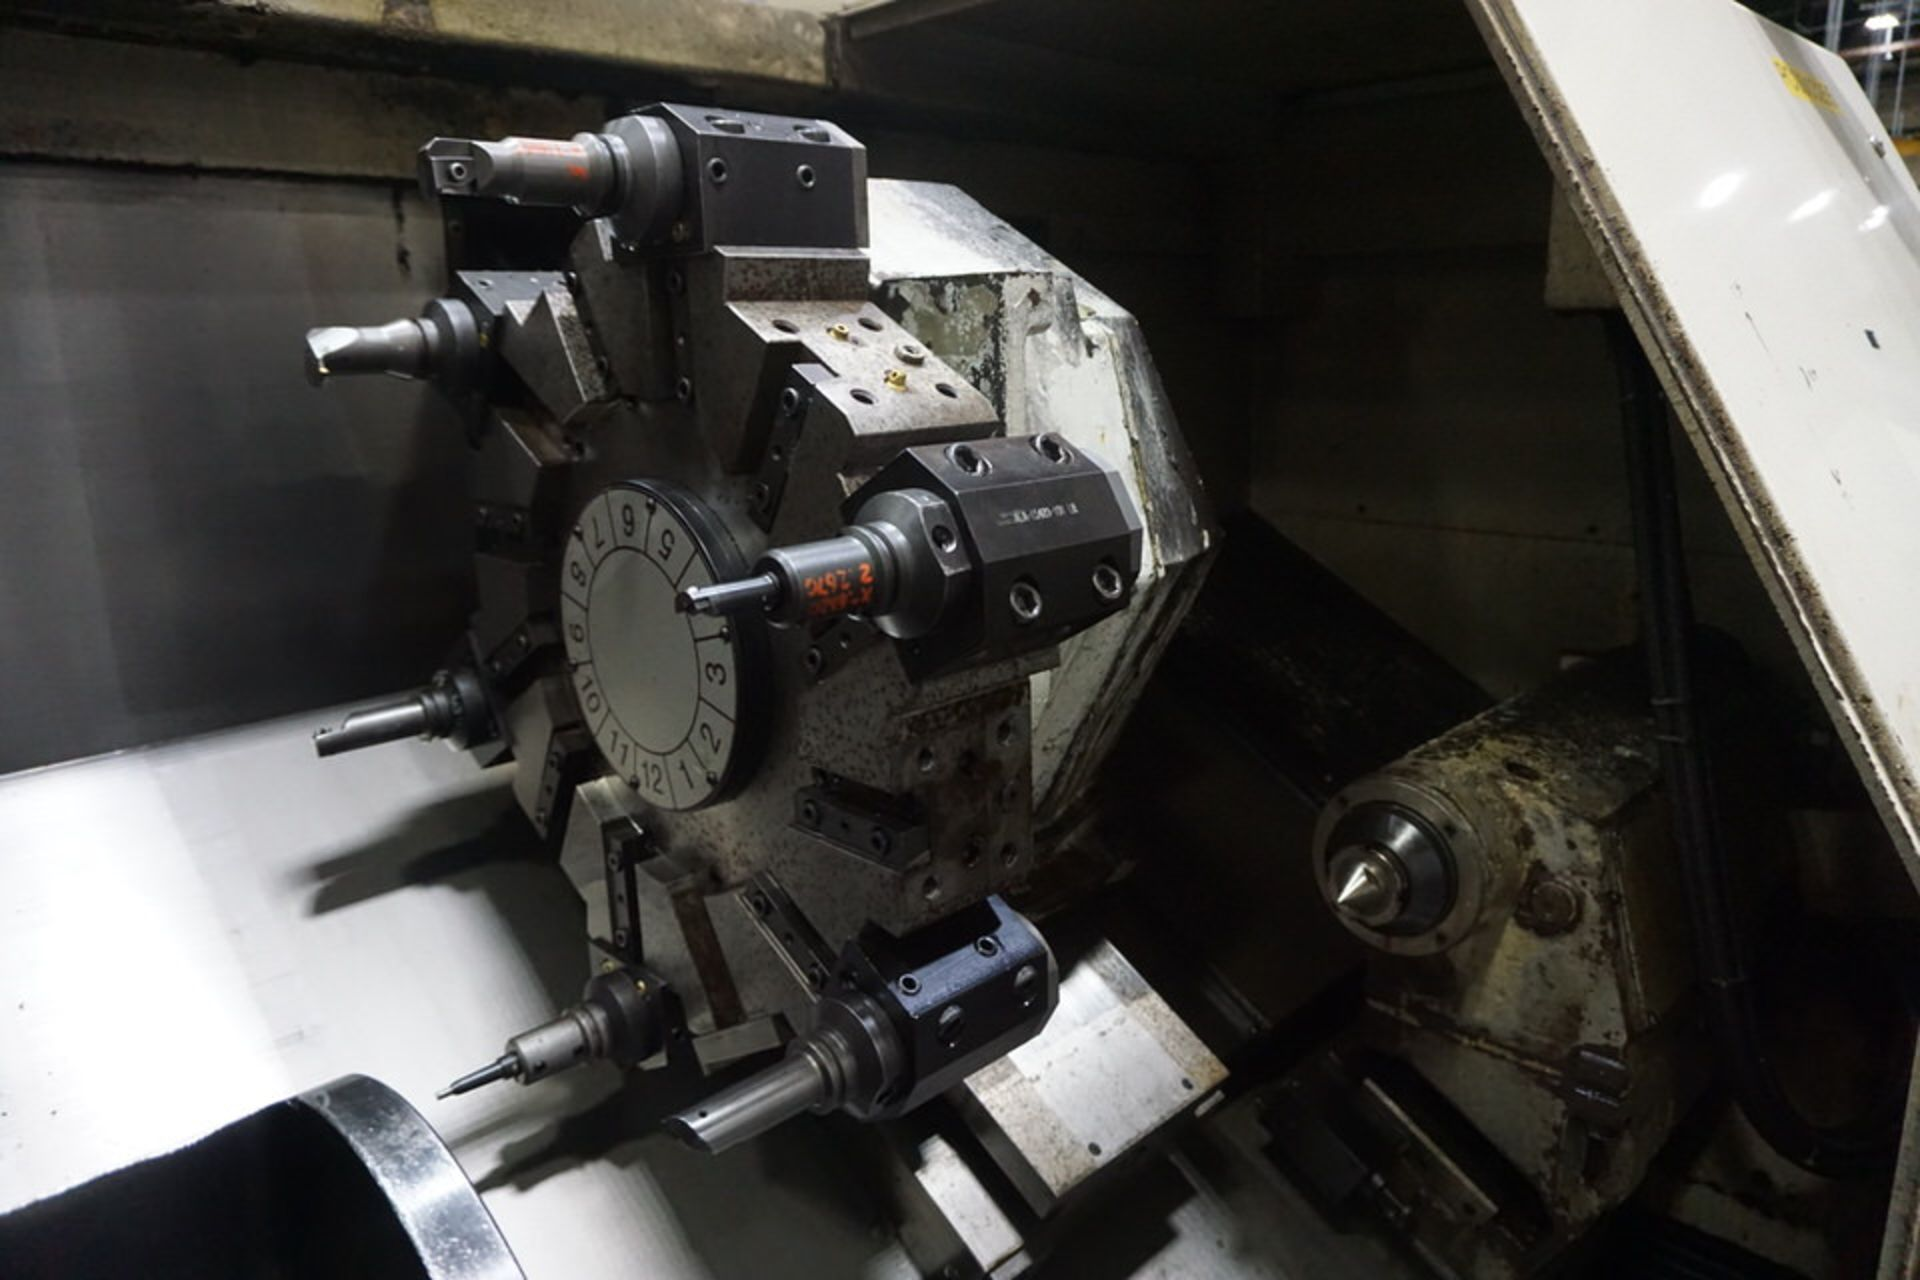 OKUMA LB35 CNC LATHE (PC0003255) - Image 5 of 8